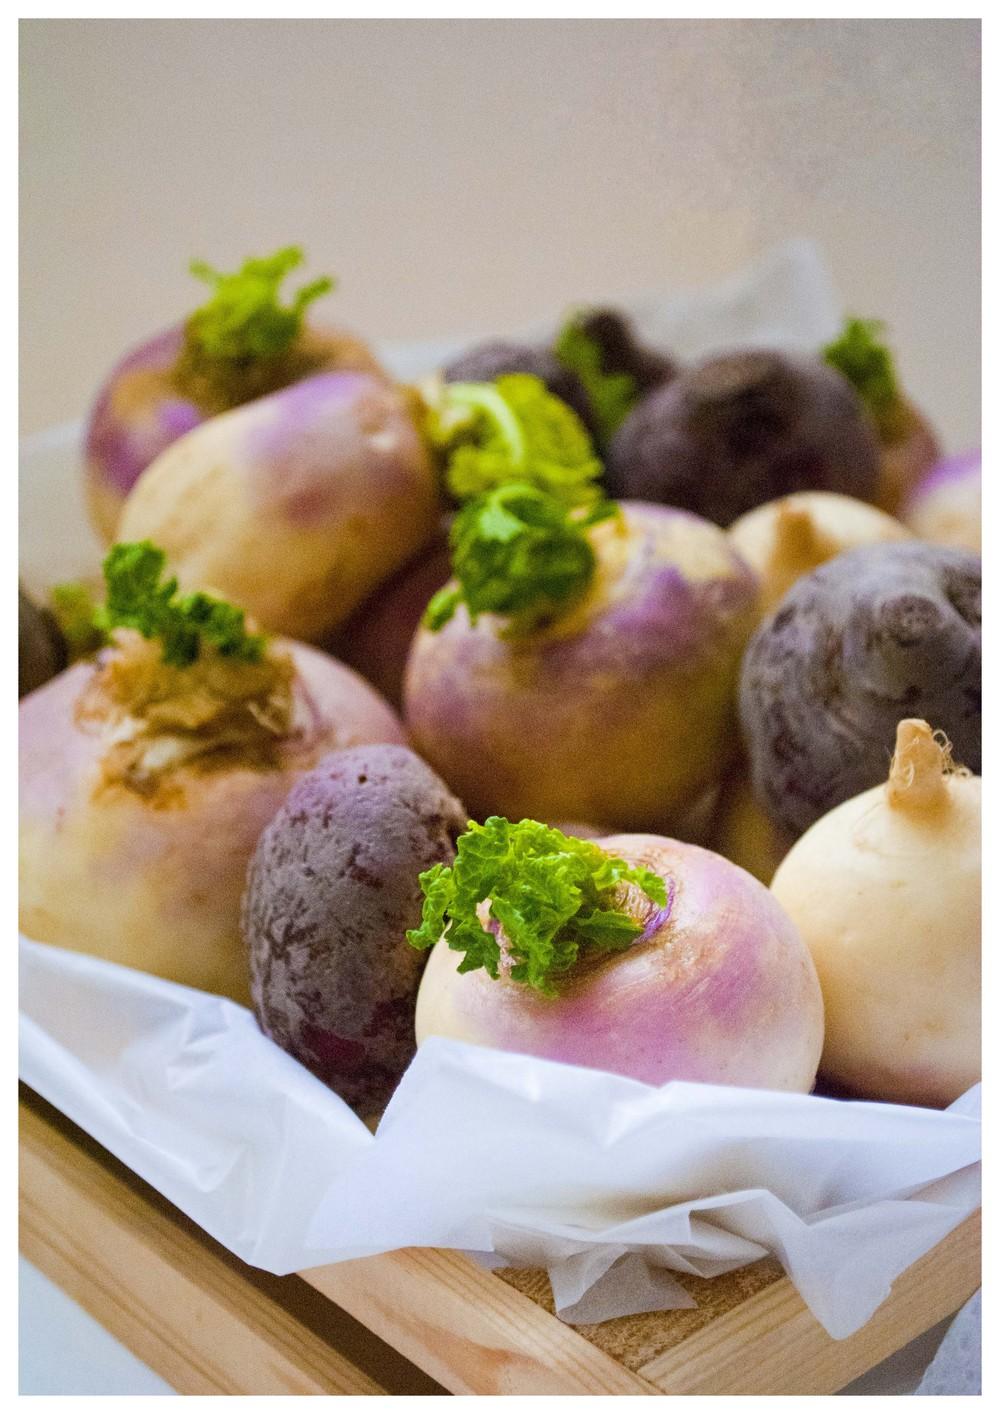 Turnips in a box